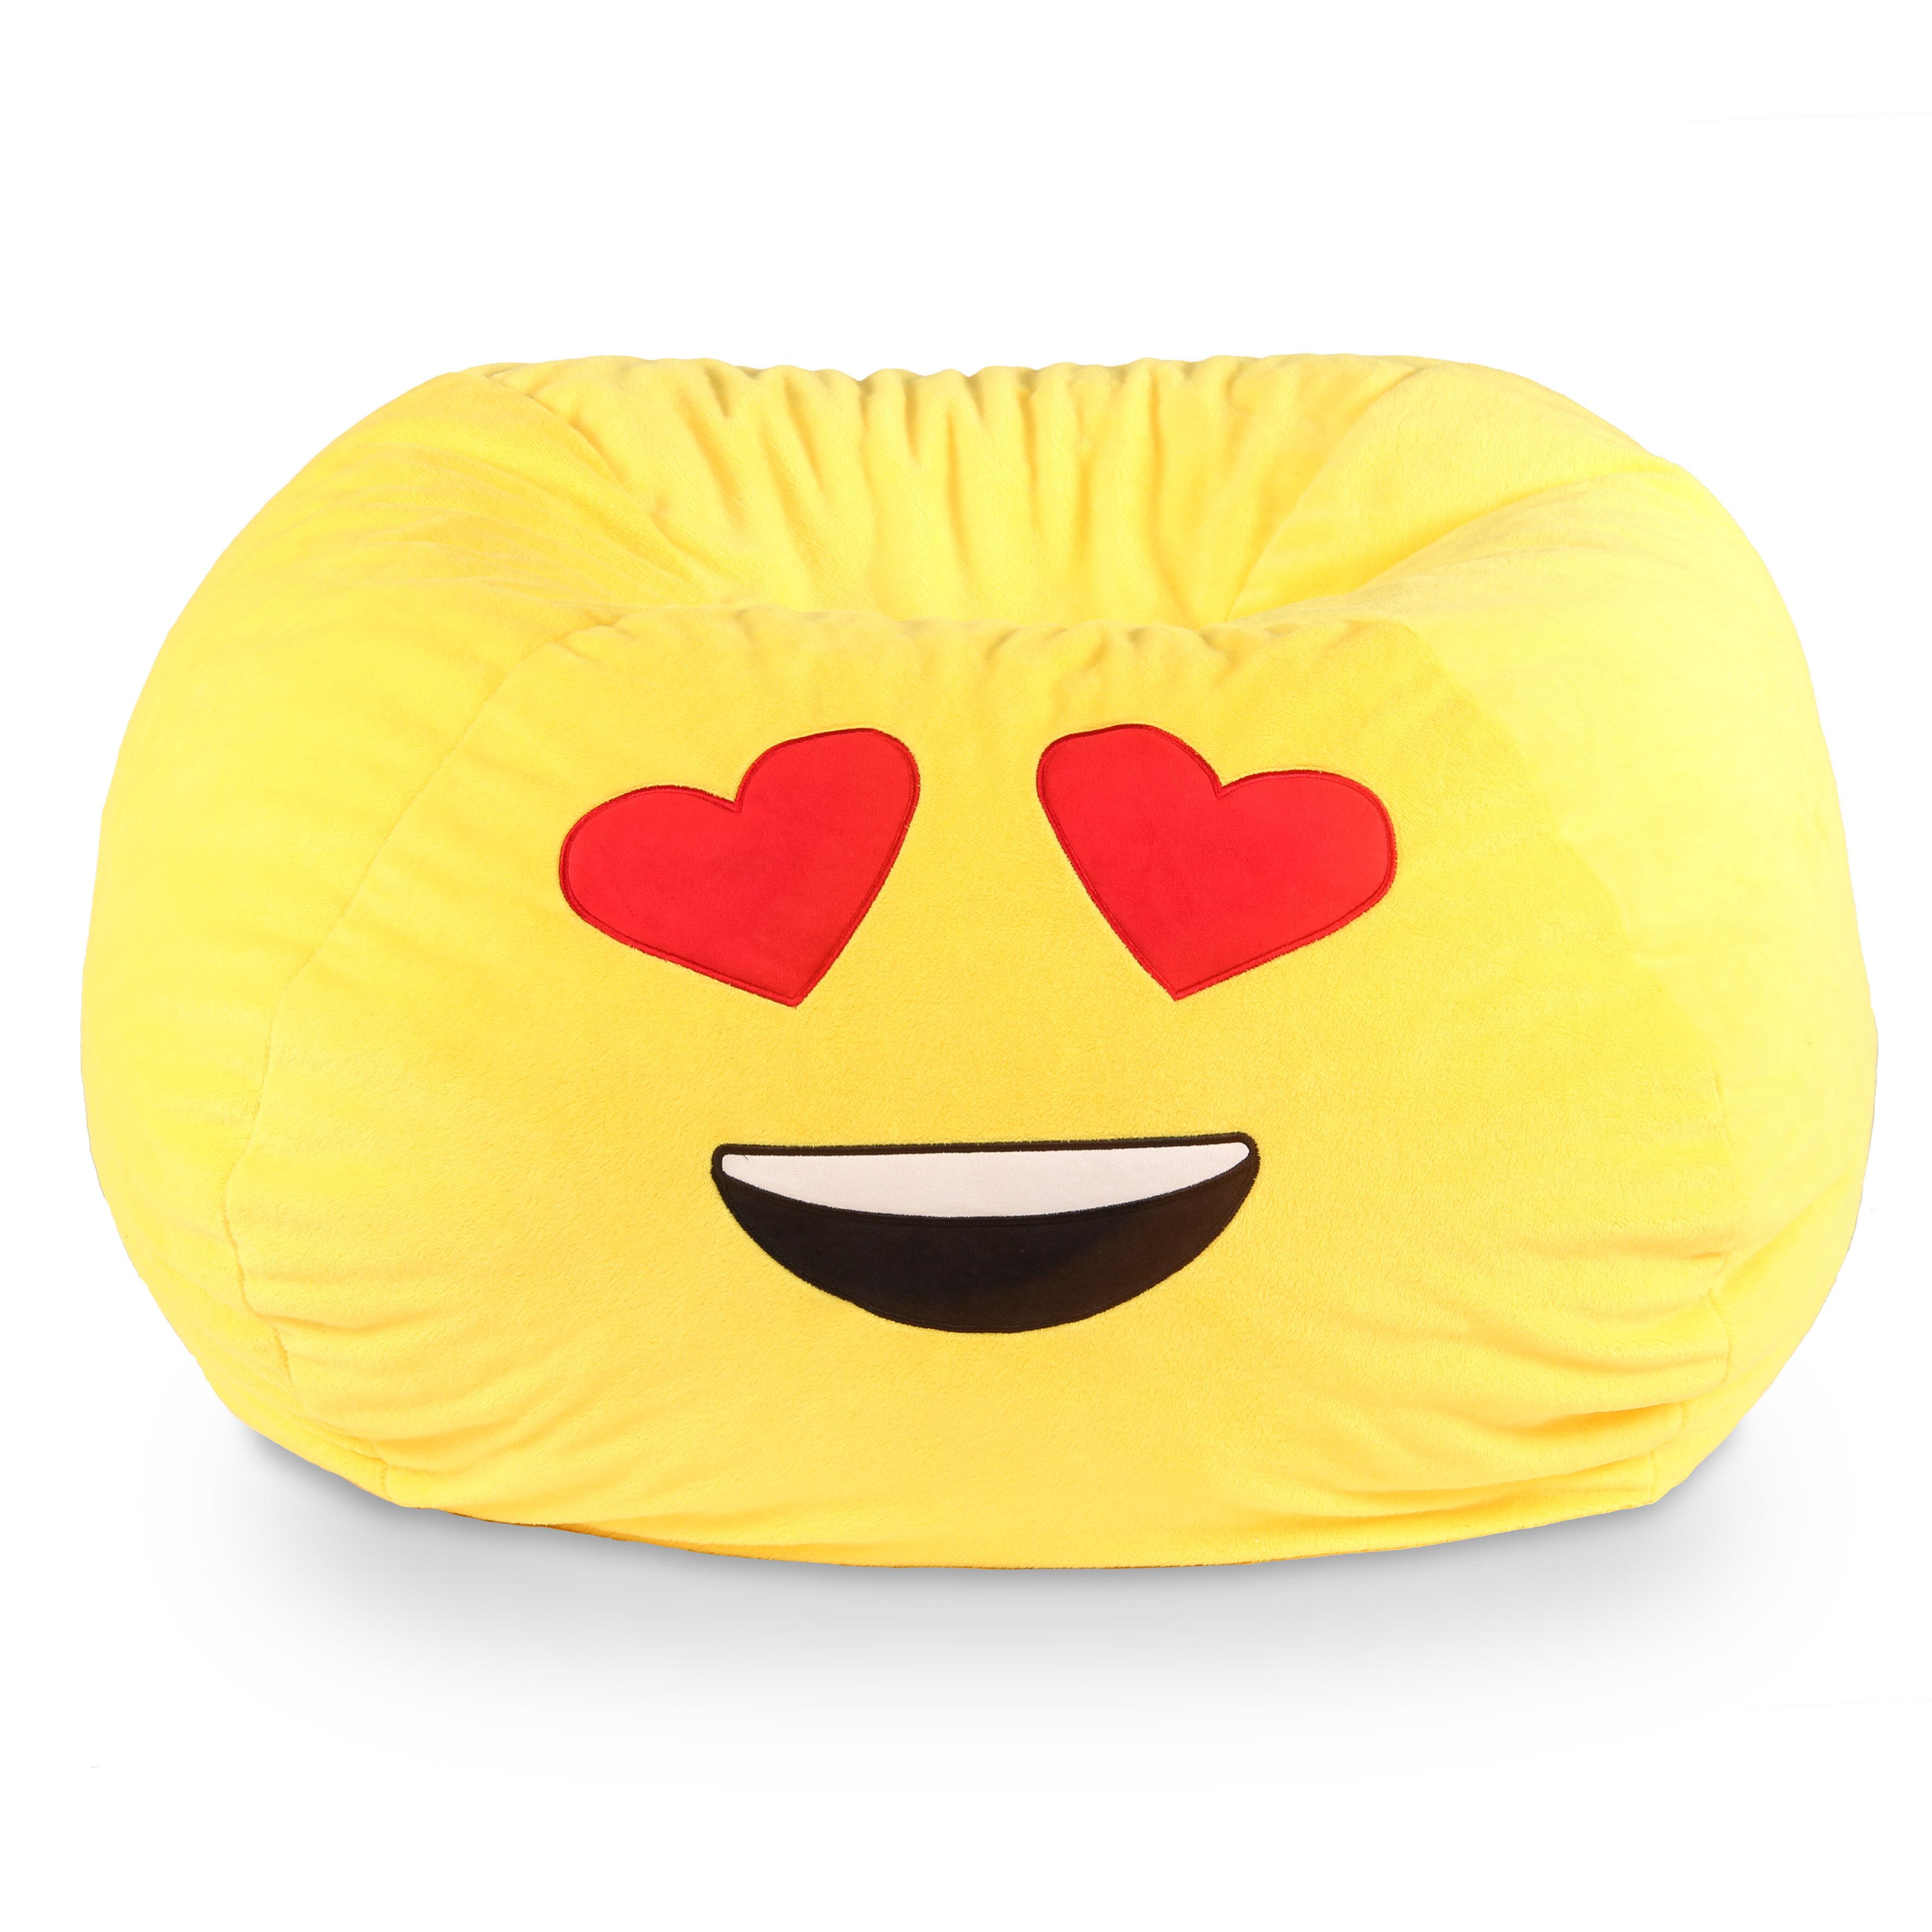 Ace casual furniture gomoji emoji heart eyes bean bag chair reviews wayfair